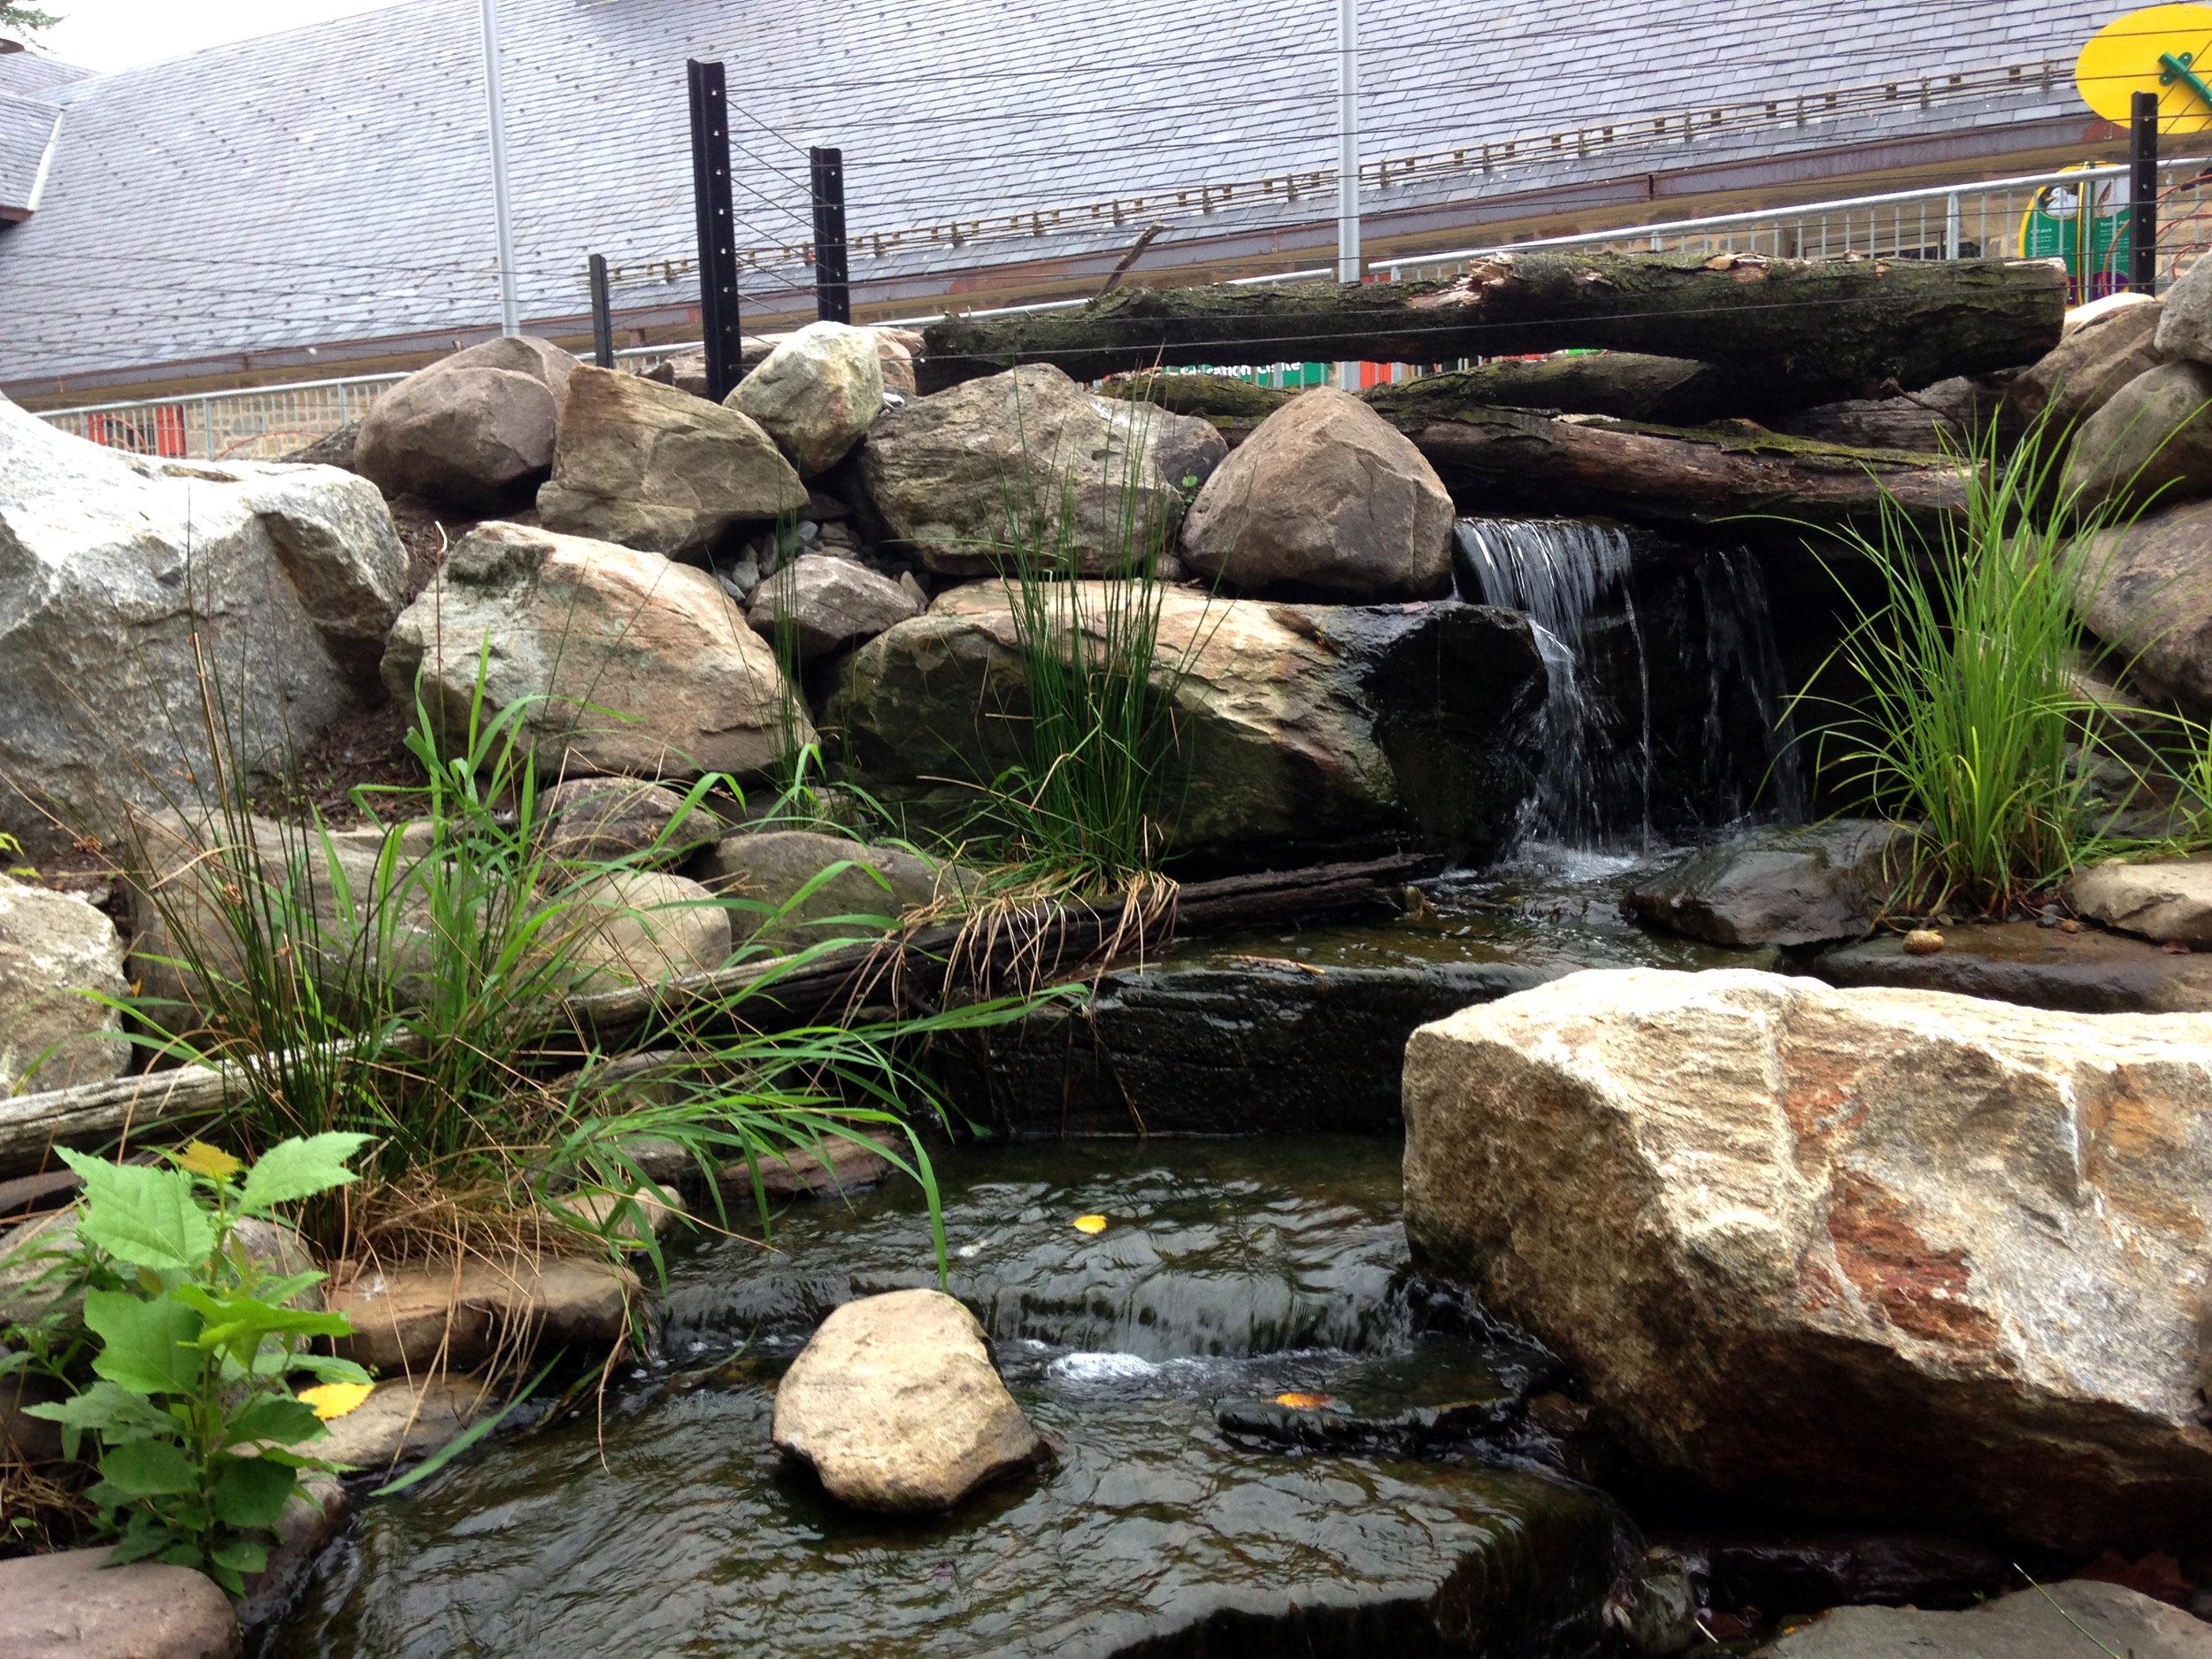 Pondworks_philadelphia zoo_duck pond_waterfall.JPG